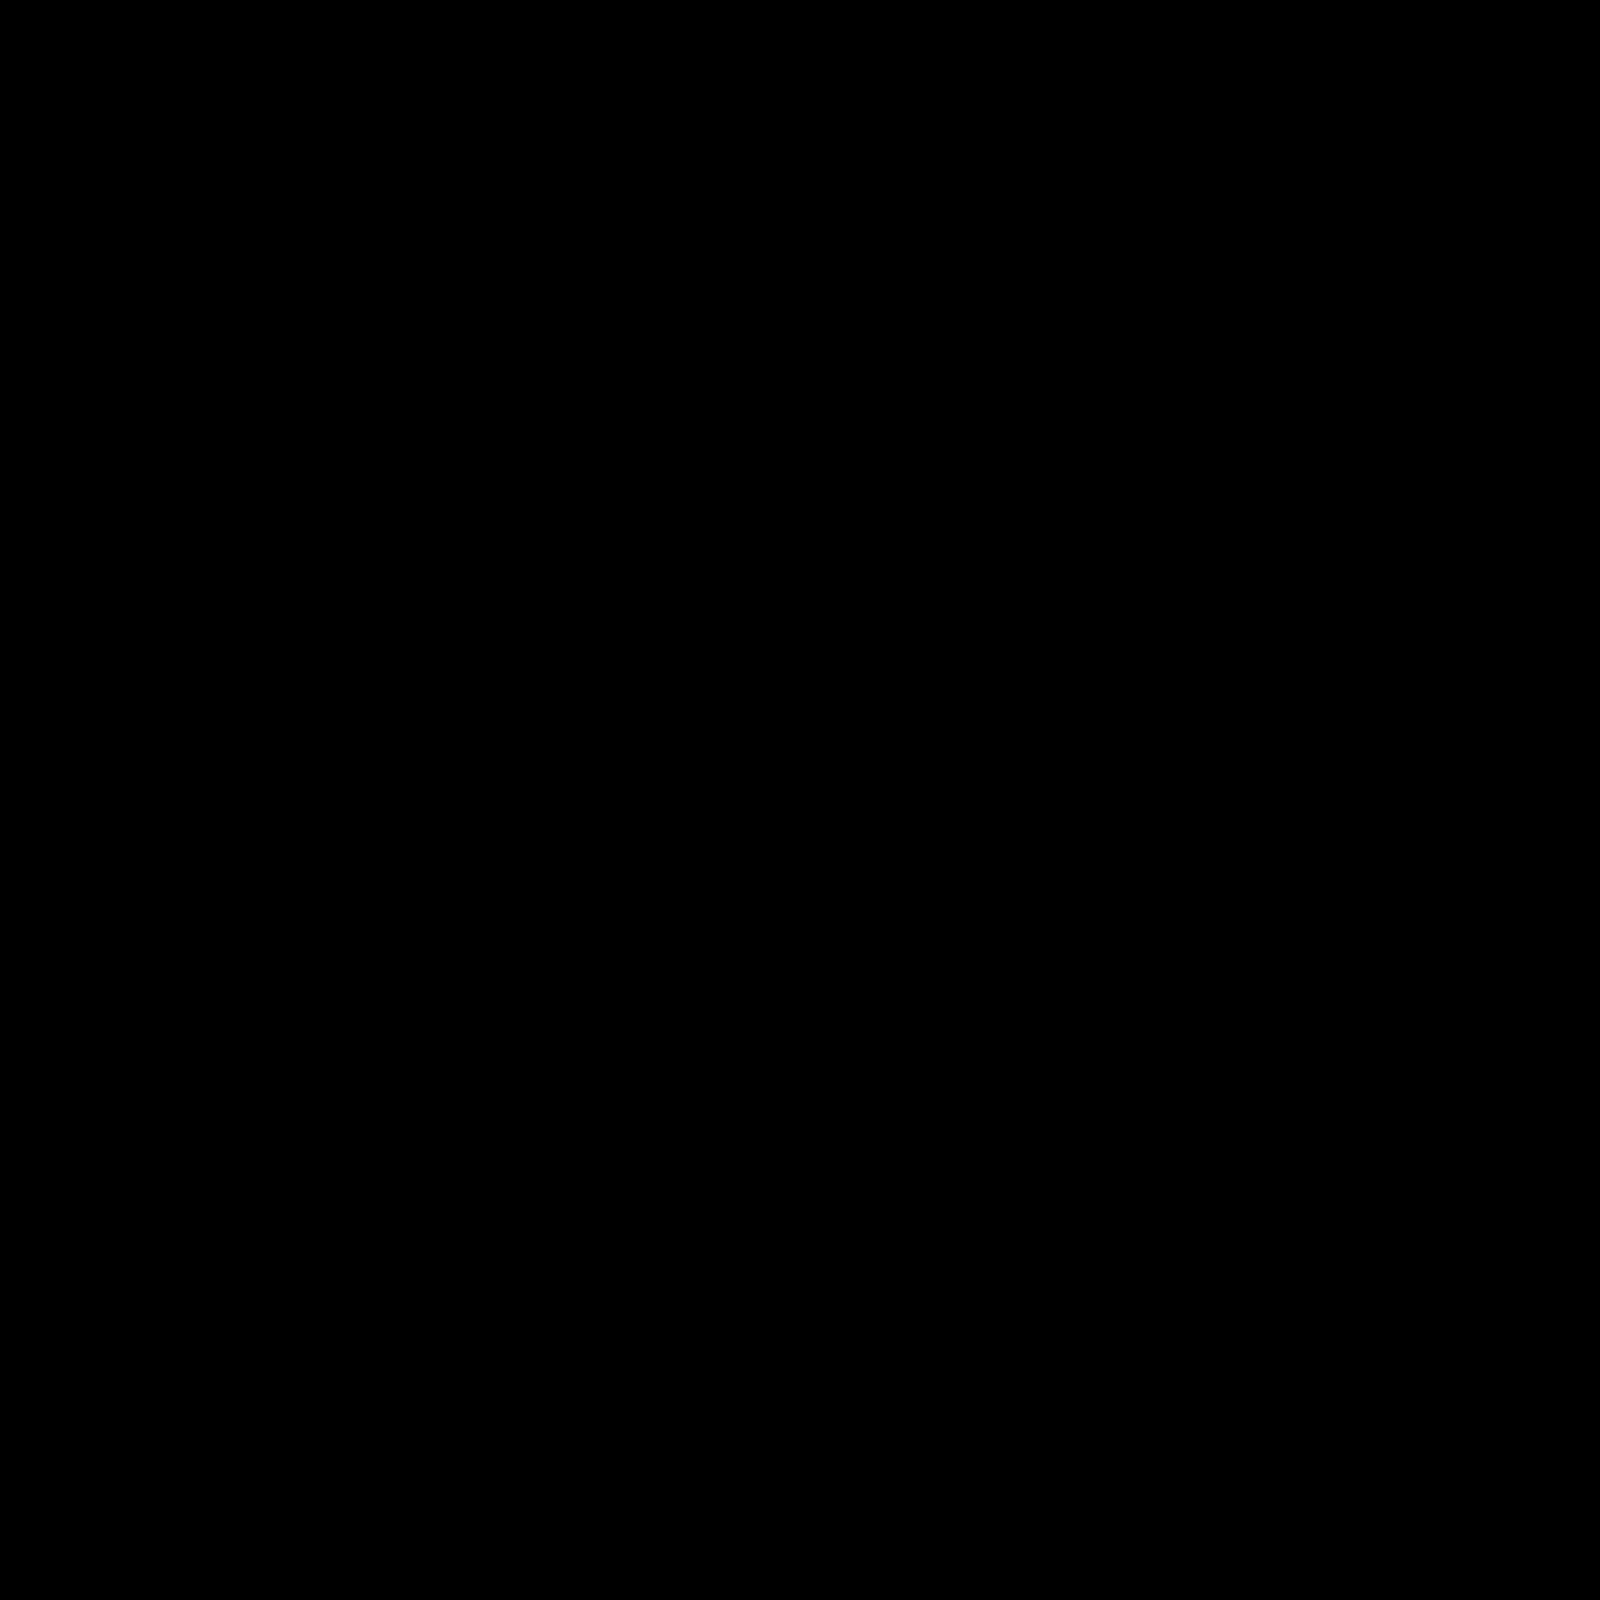 年金受給者 icon